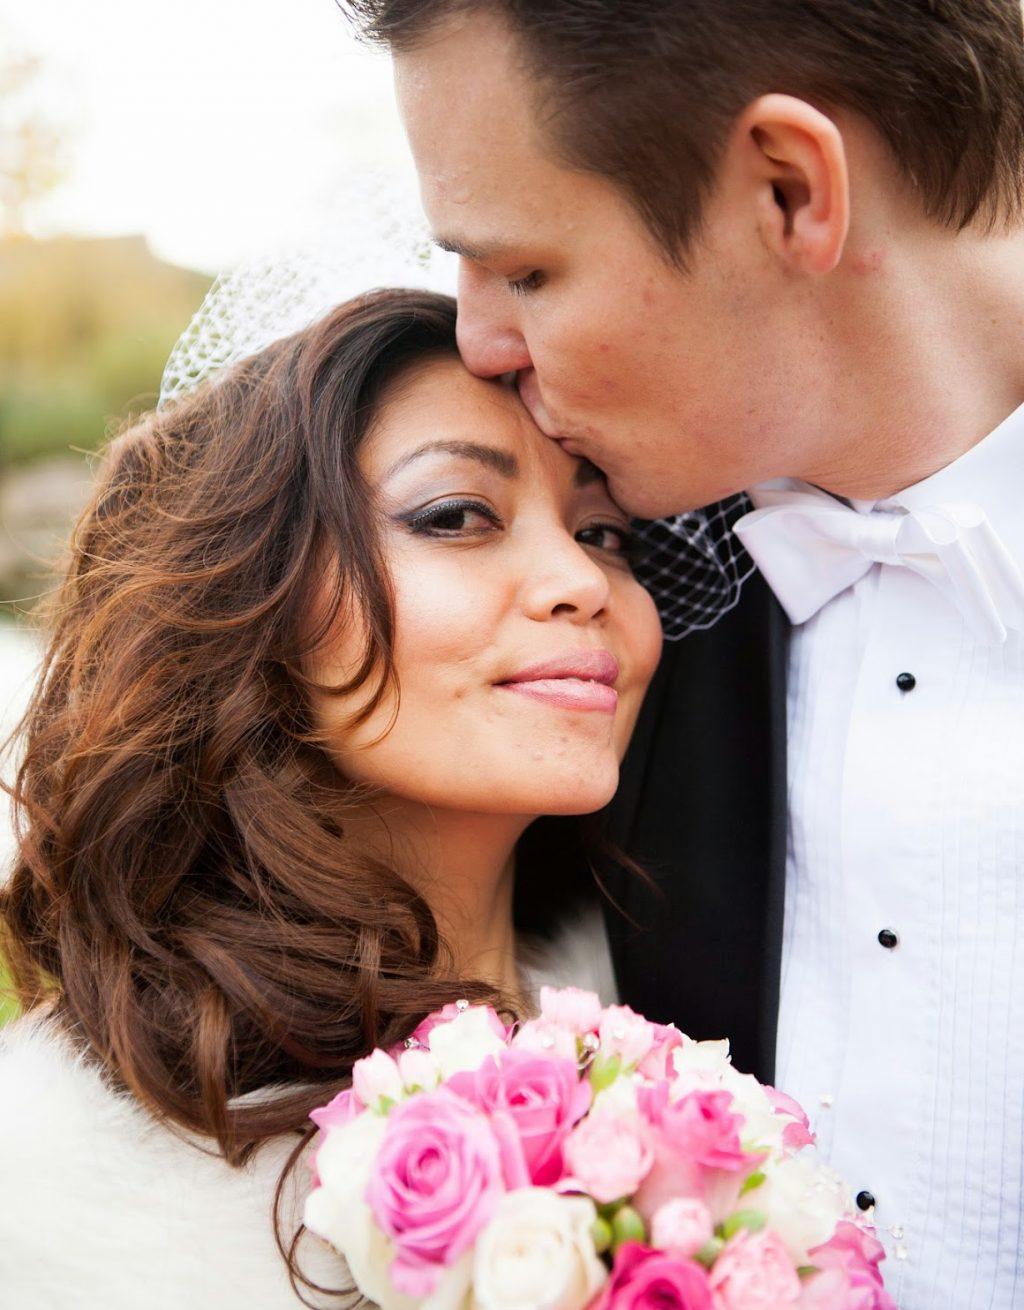 img src=wedding photography bristol.jpg alt=wedding couple (13)